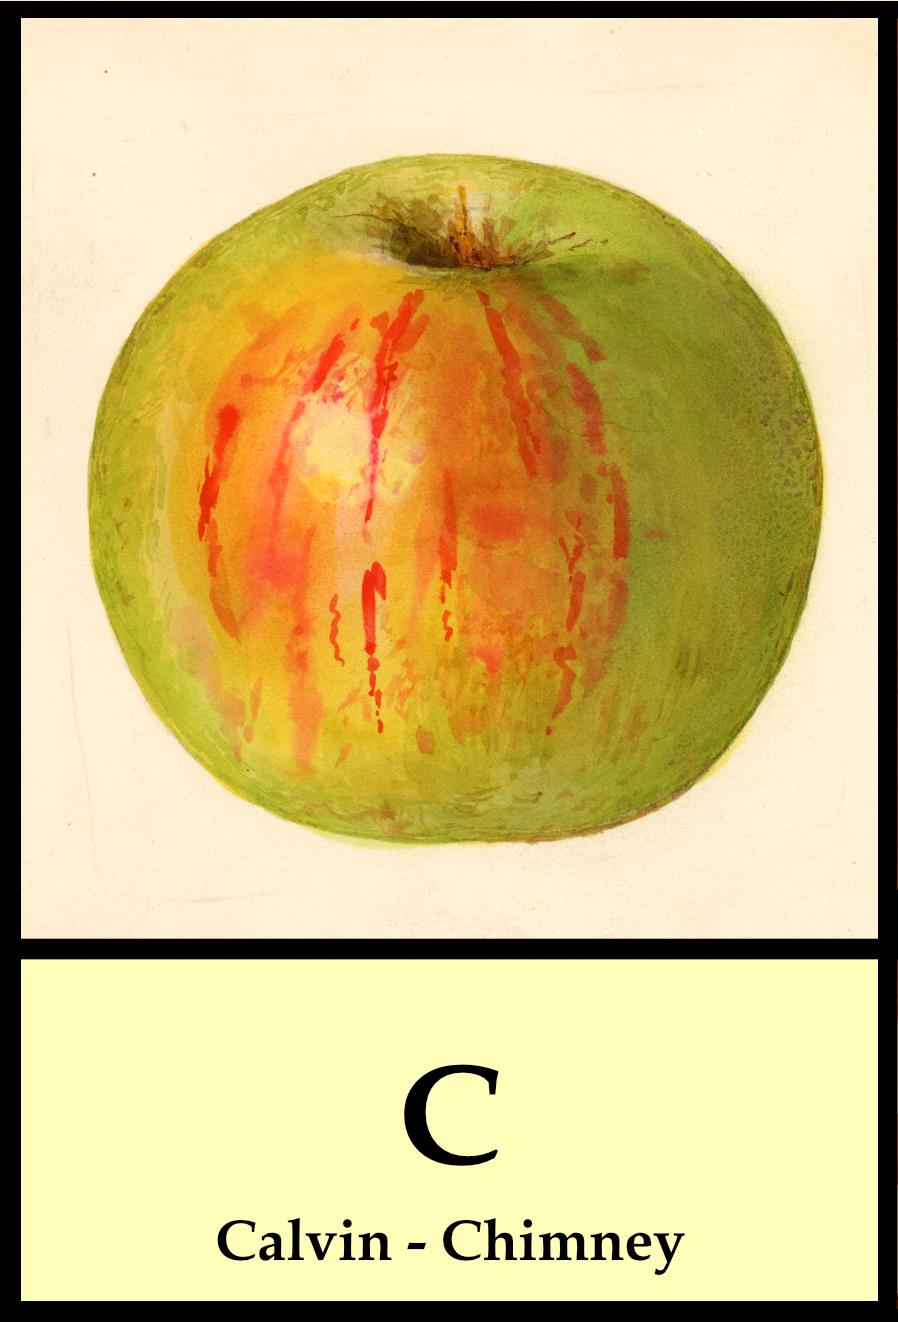 C apples - Calvin to Chimney